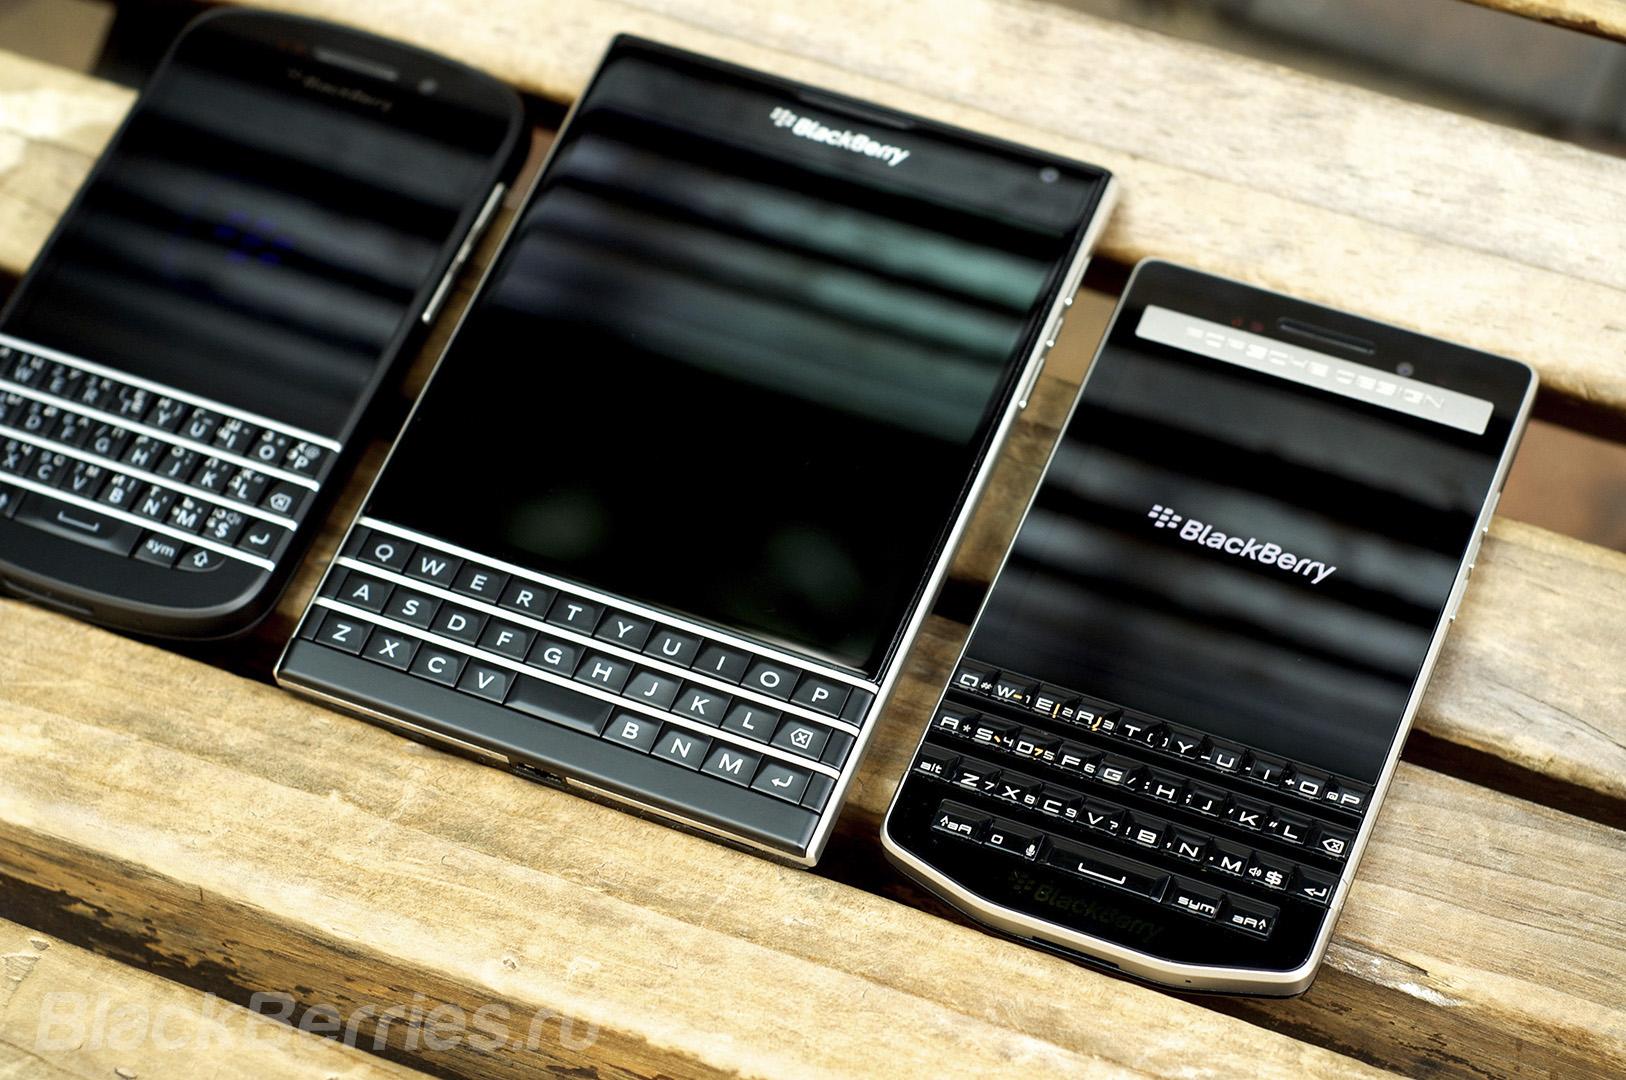 BlackBerry-Passport-Review-2014-16